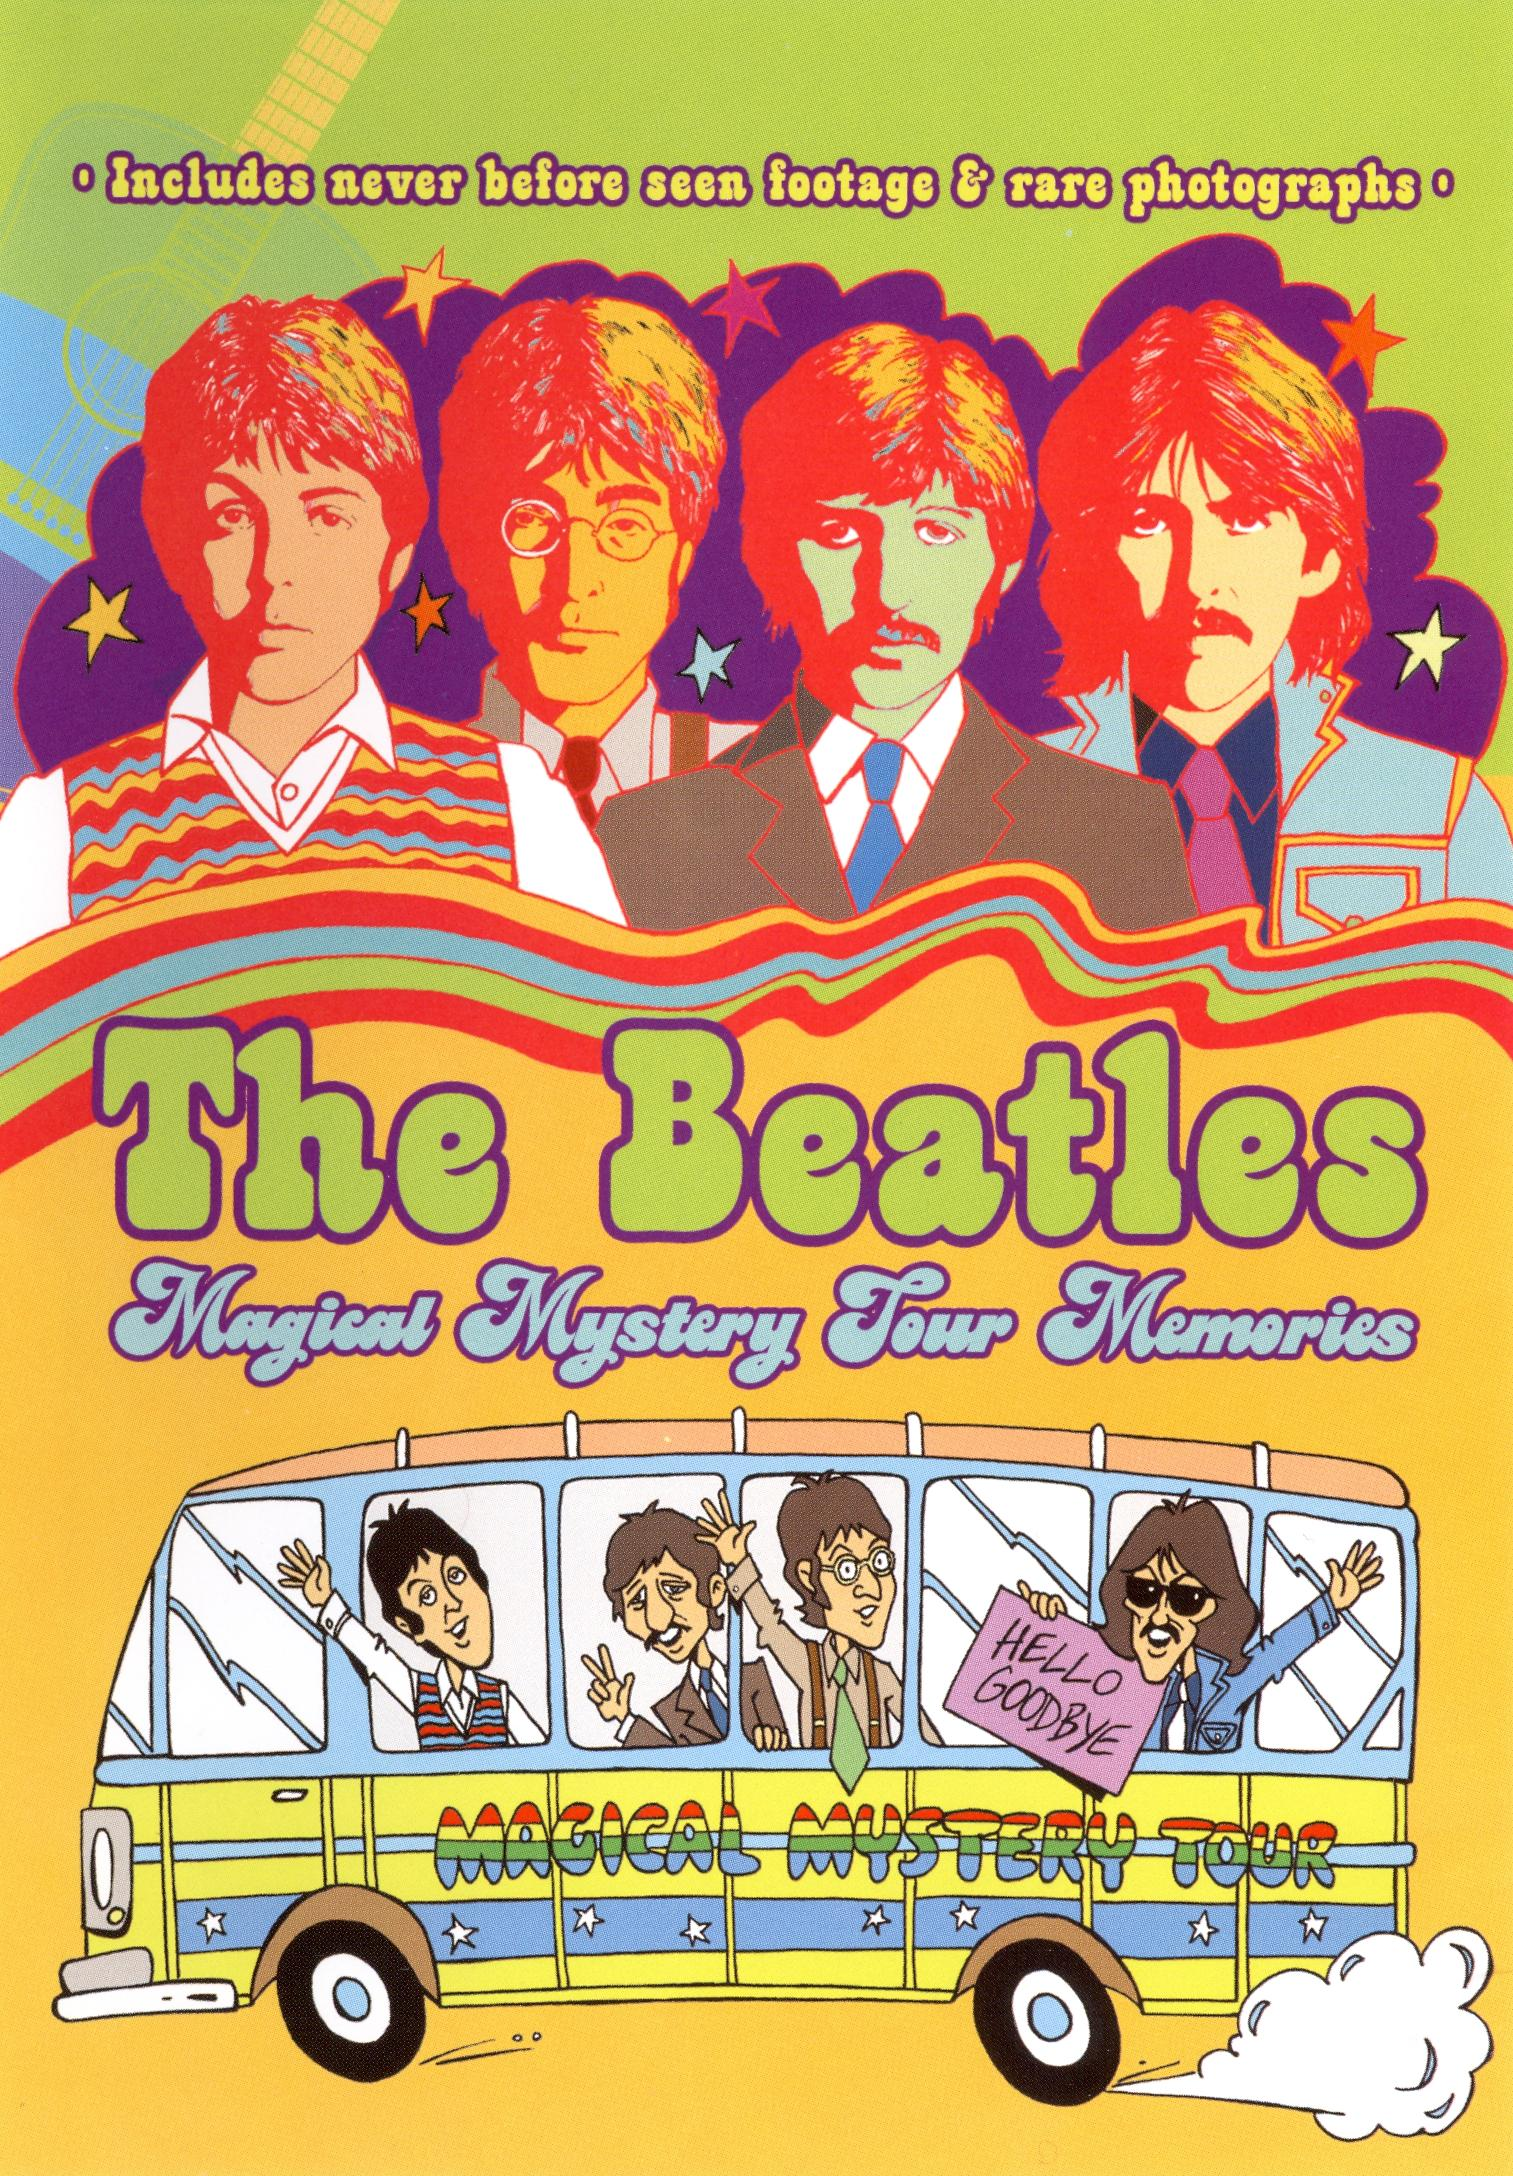 The Beatles  Wikipedia